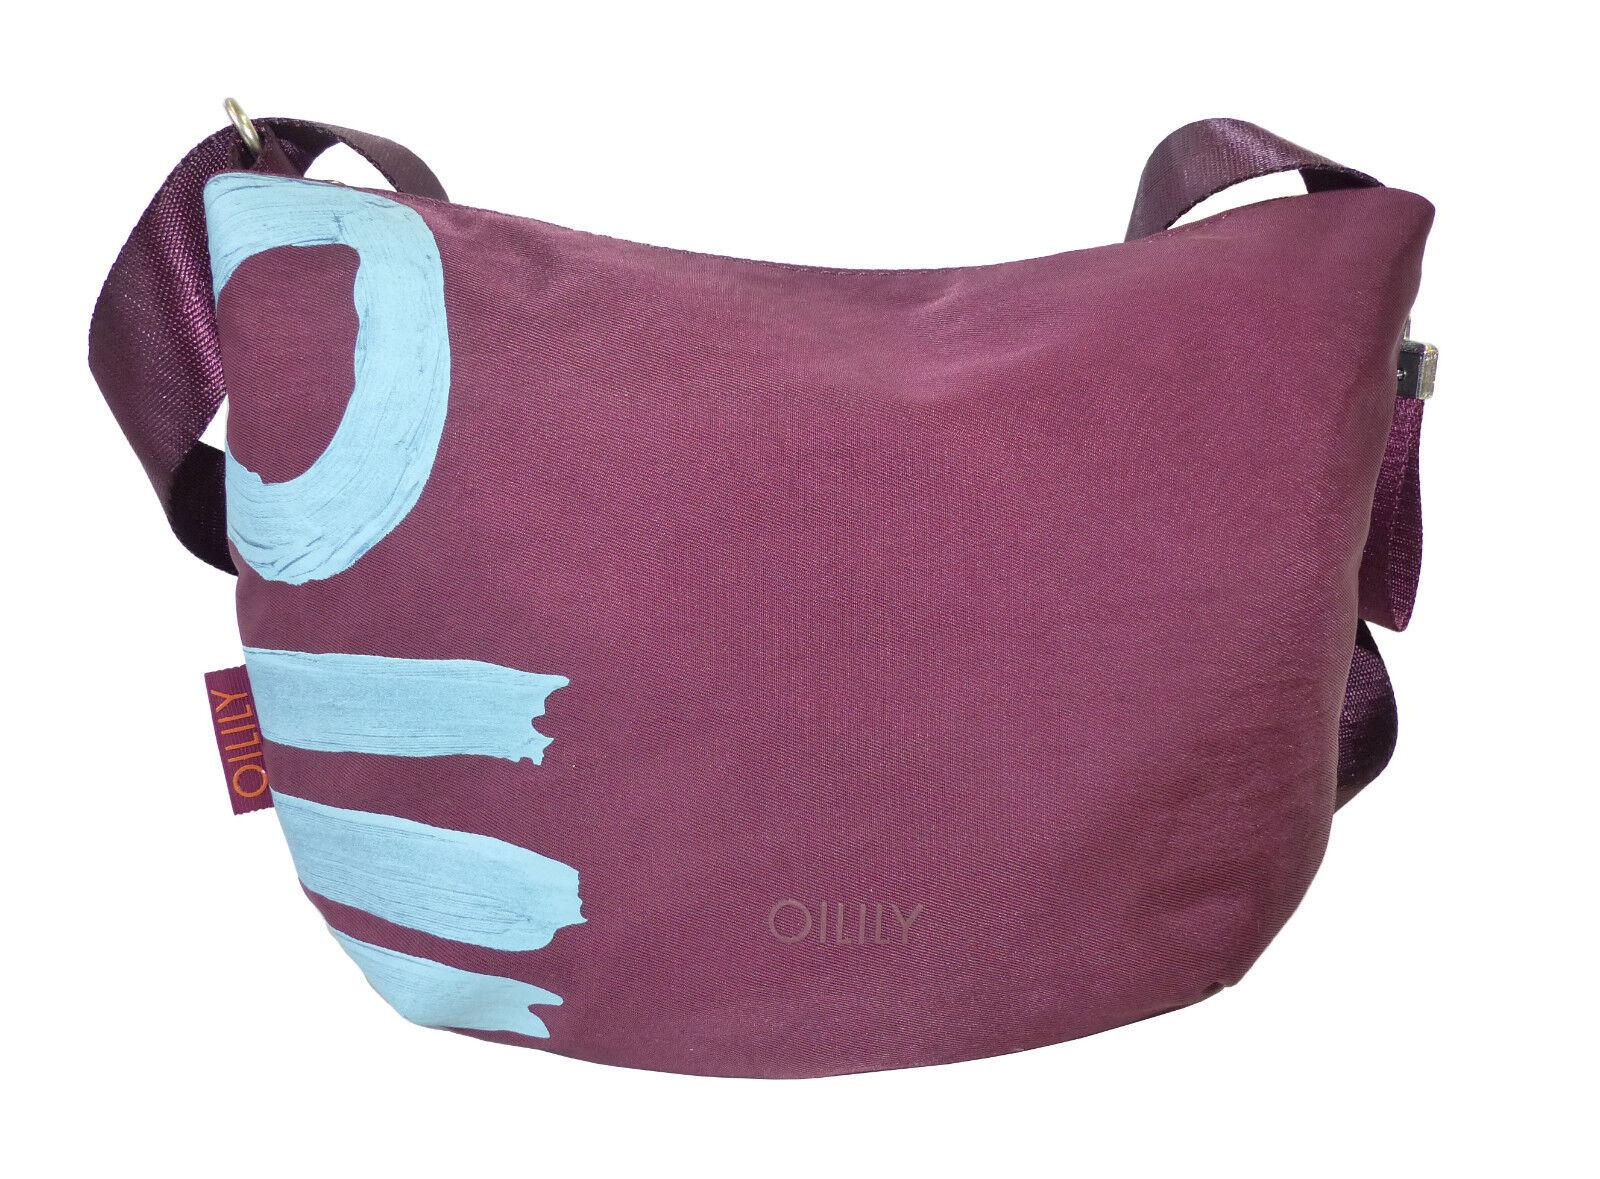 NEU Oilily Tasche Fun Nylon Nylon Nylon SVZ Shoulderbag Damen Schultertasche Umhängetasche    | Innovation  c140ae